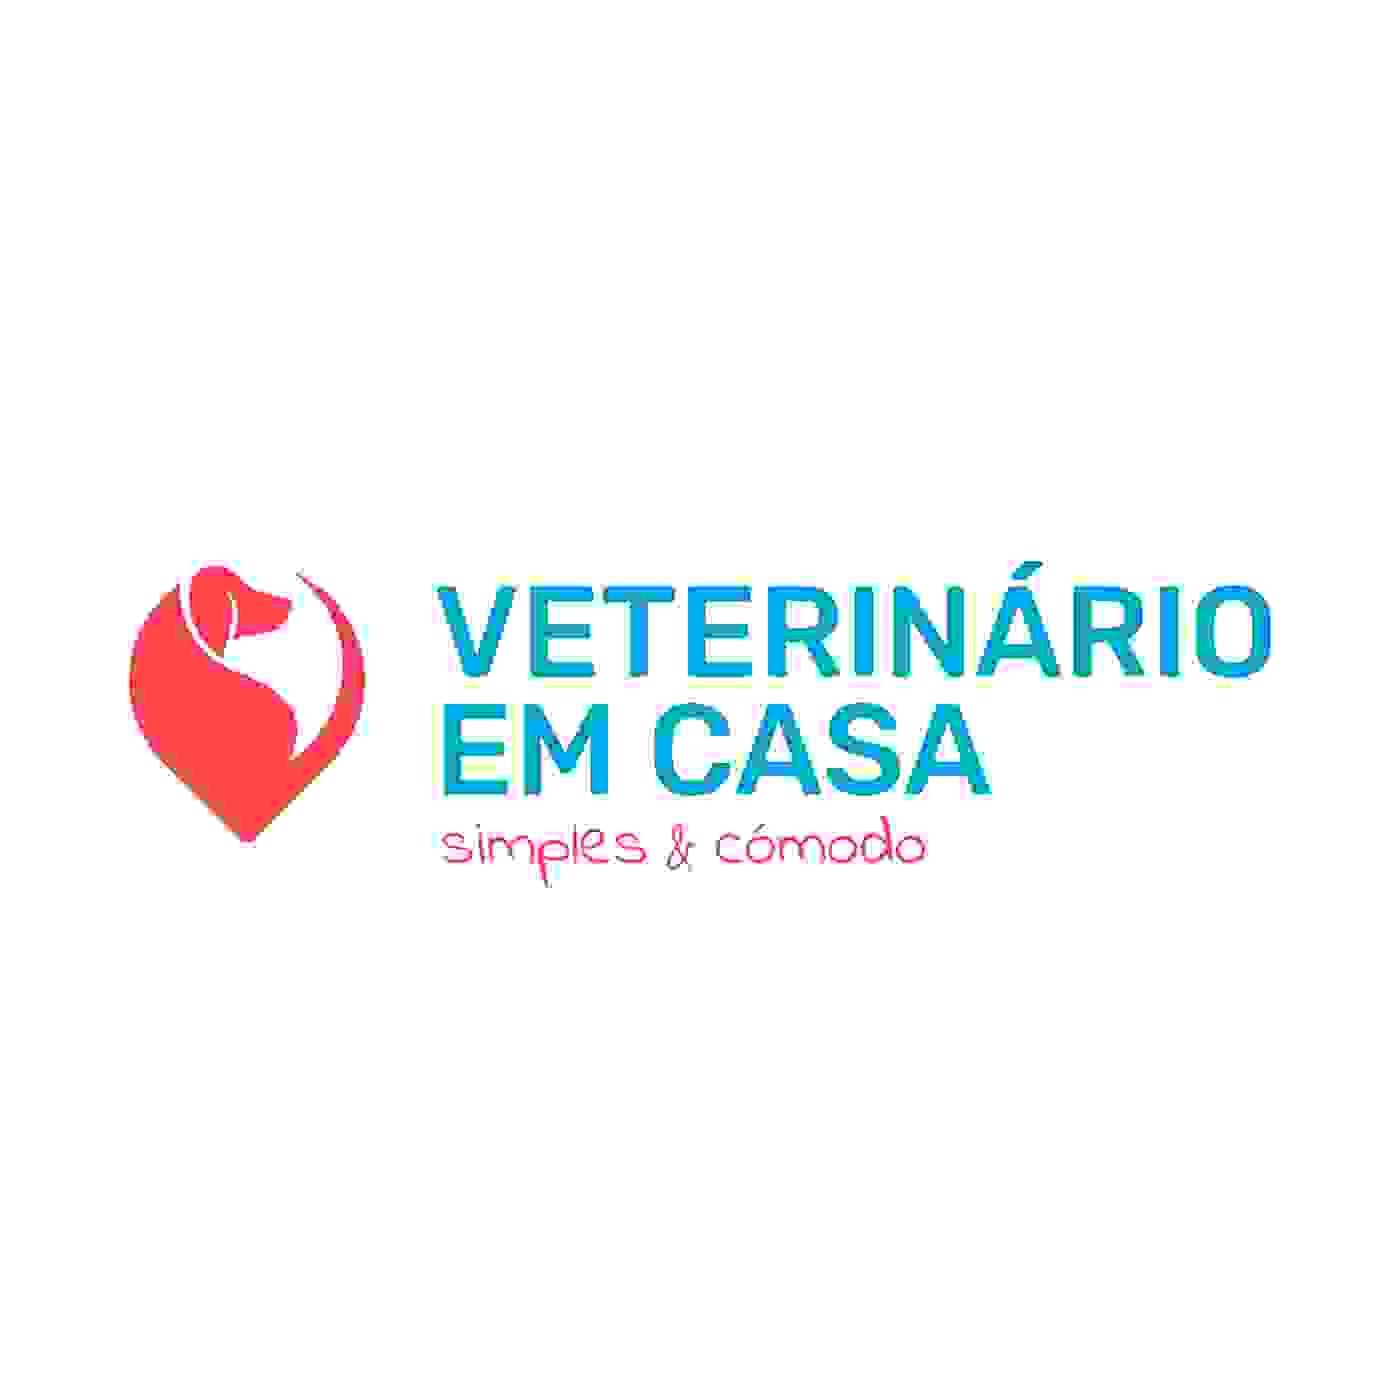 veterinario-em-casa-2